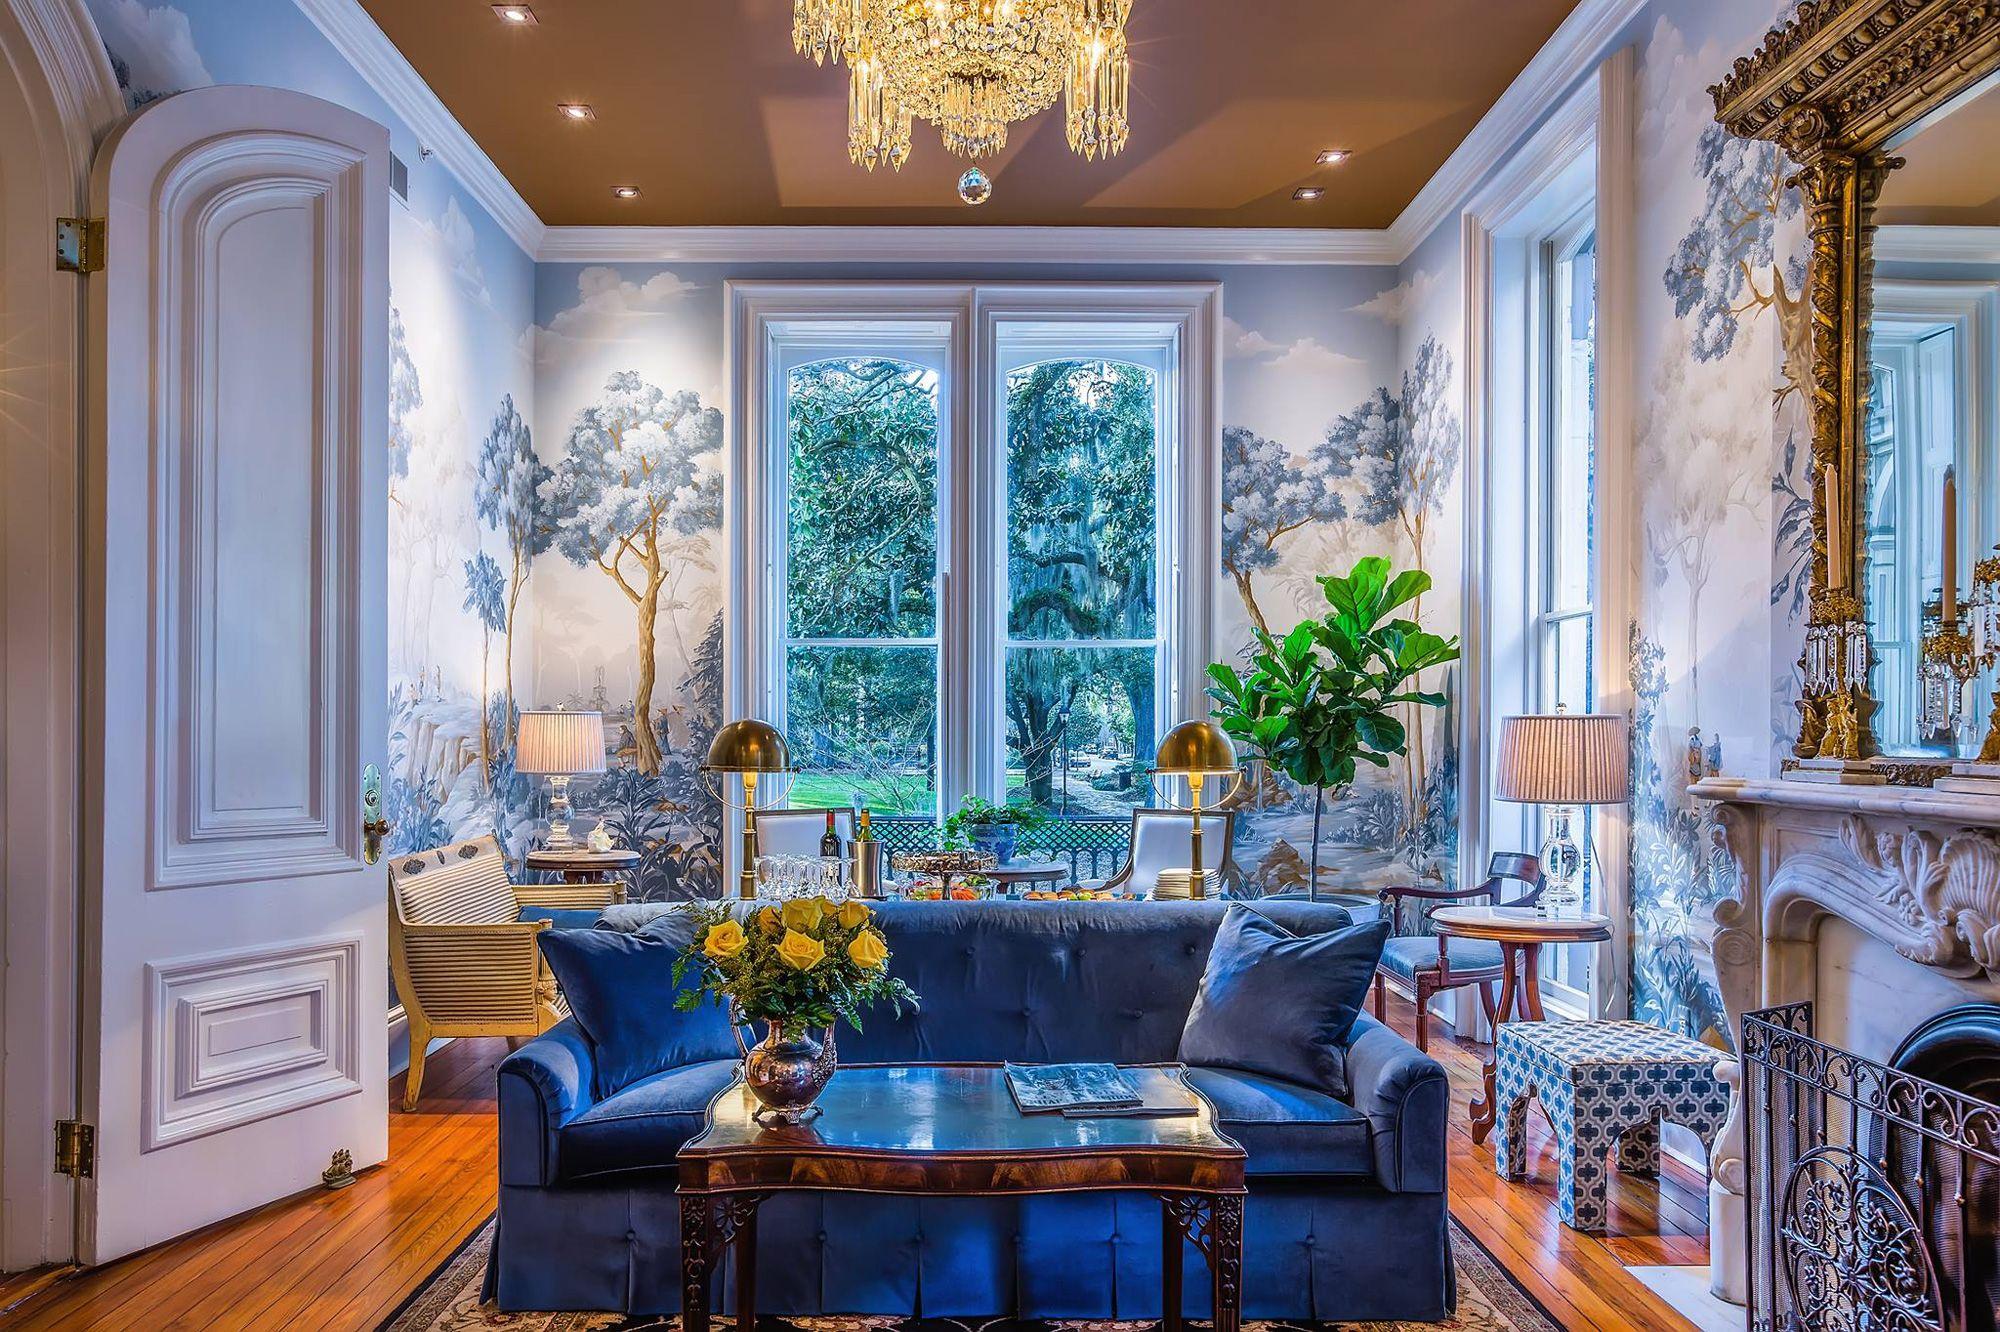 Savannah S 10 Most Romantic Escapes Savannah Chat Romantic Hotel Places In America